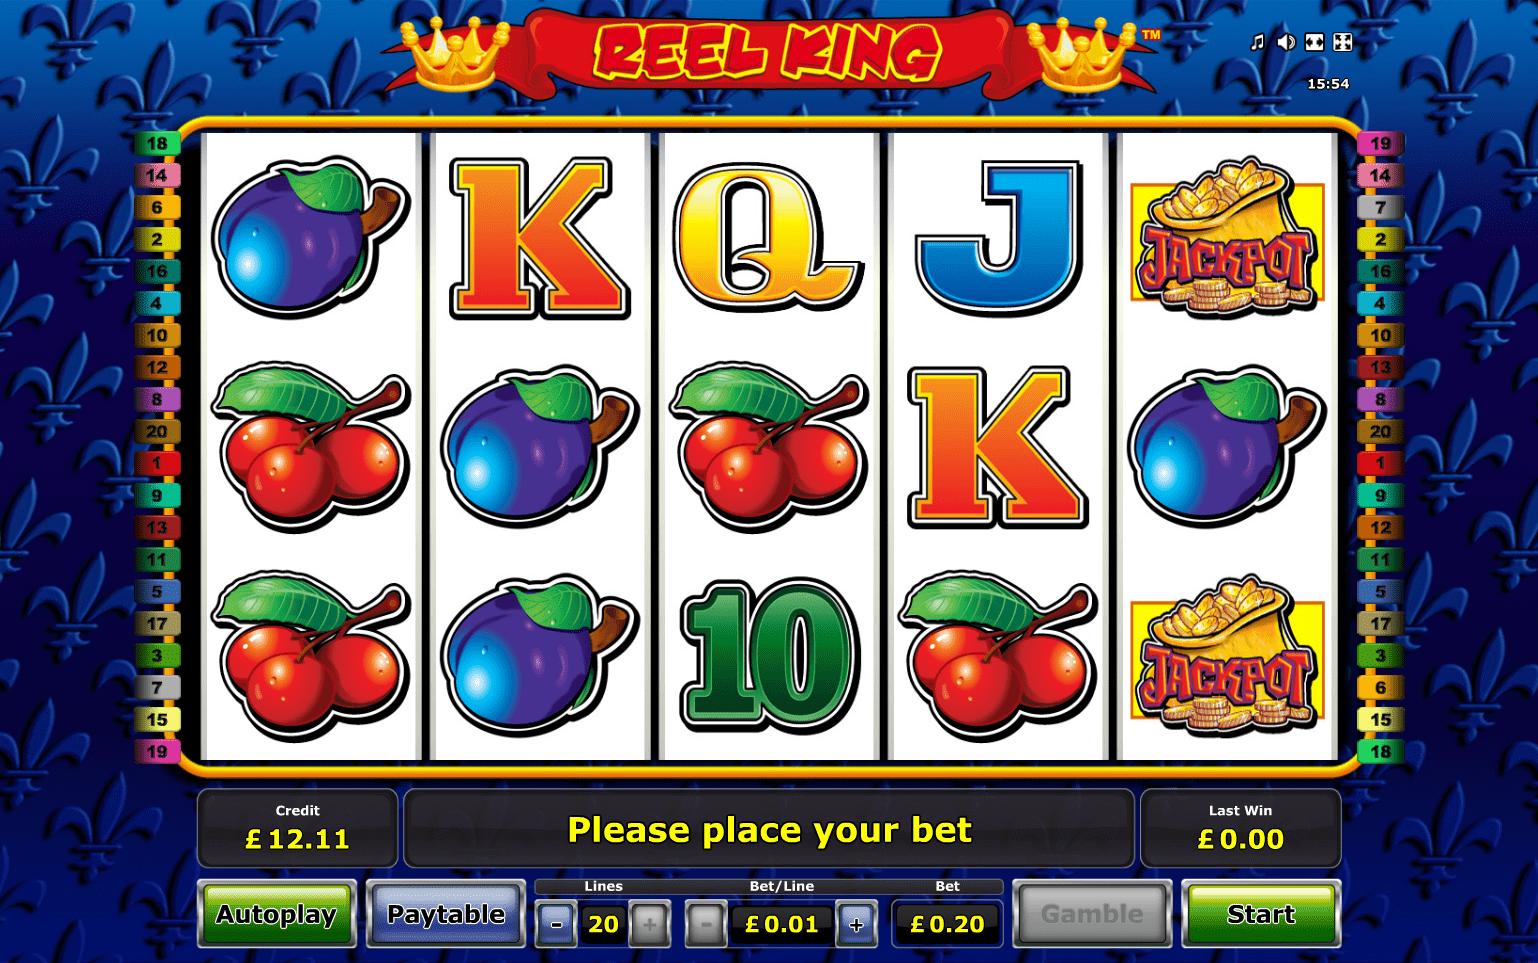 4 Reel King Slot Machine